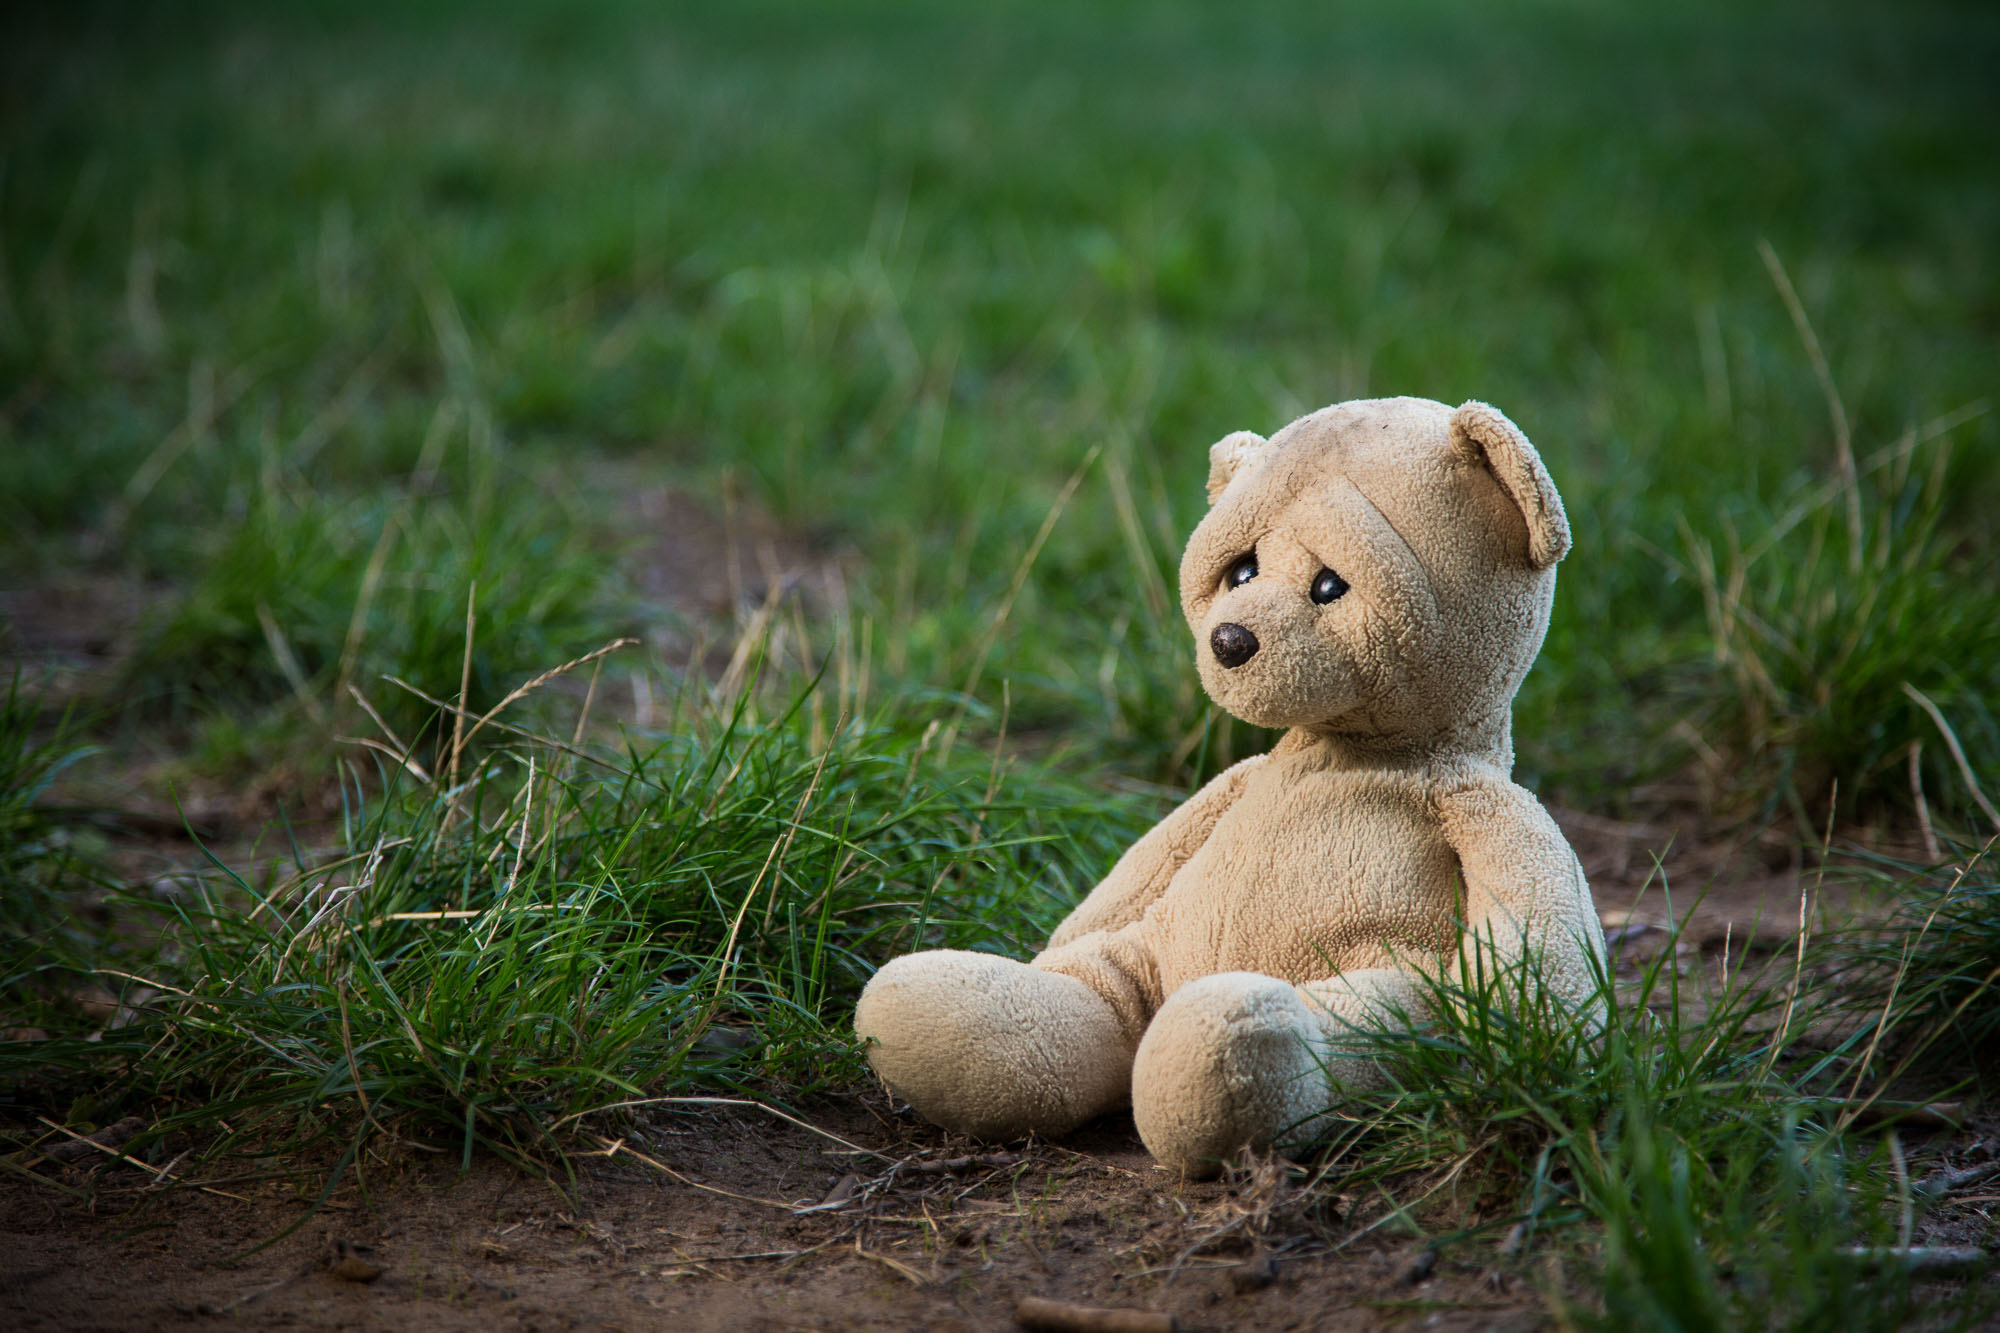 kamerakata / Teddy